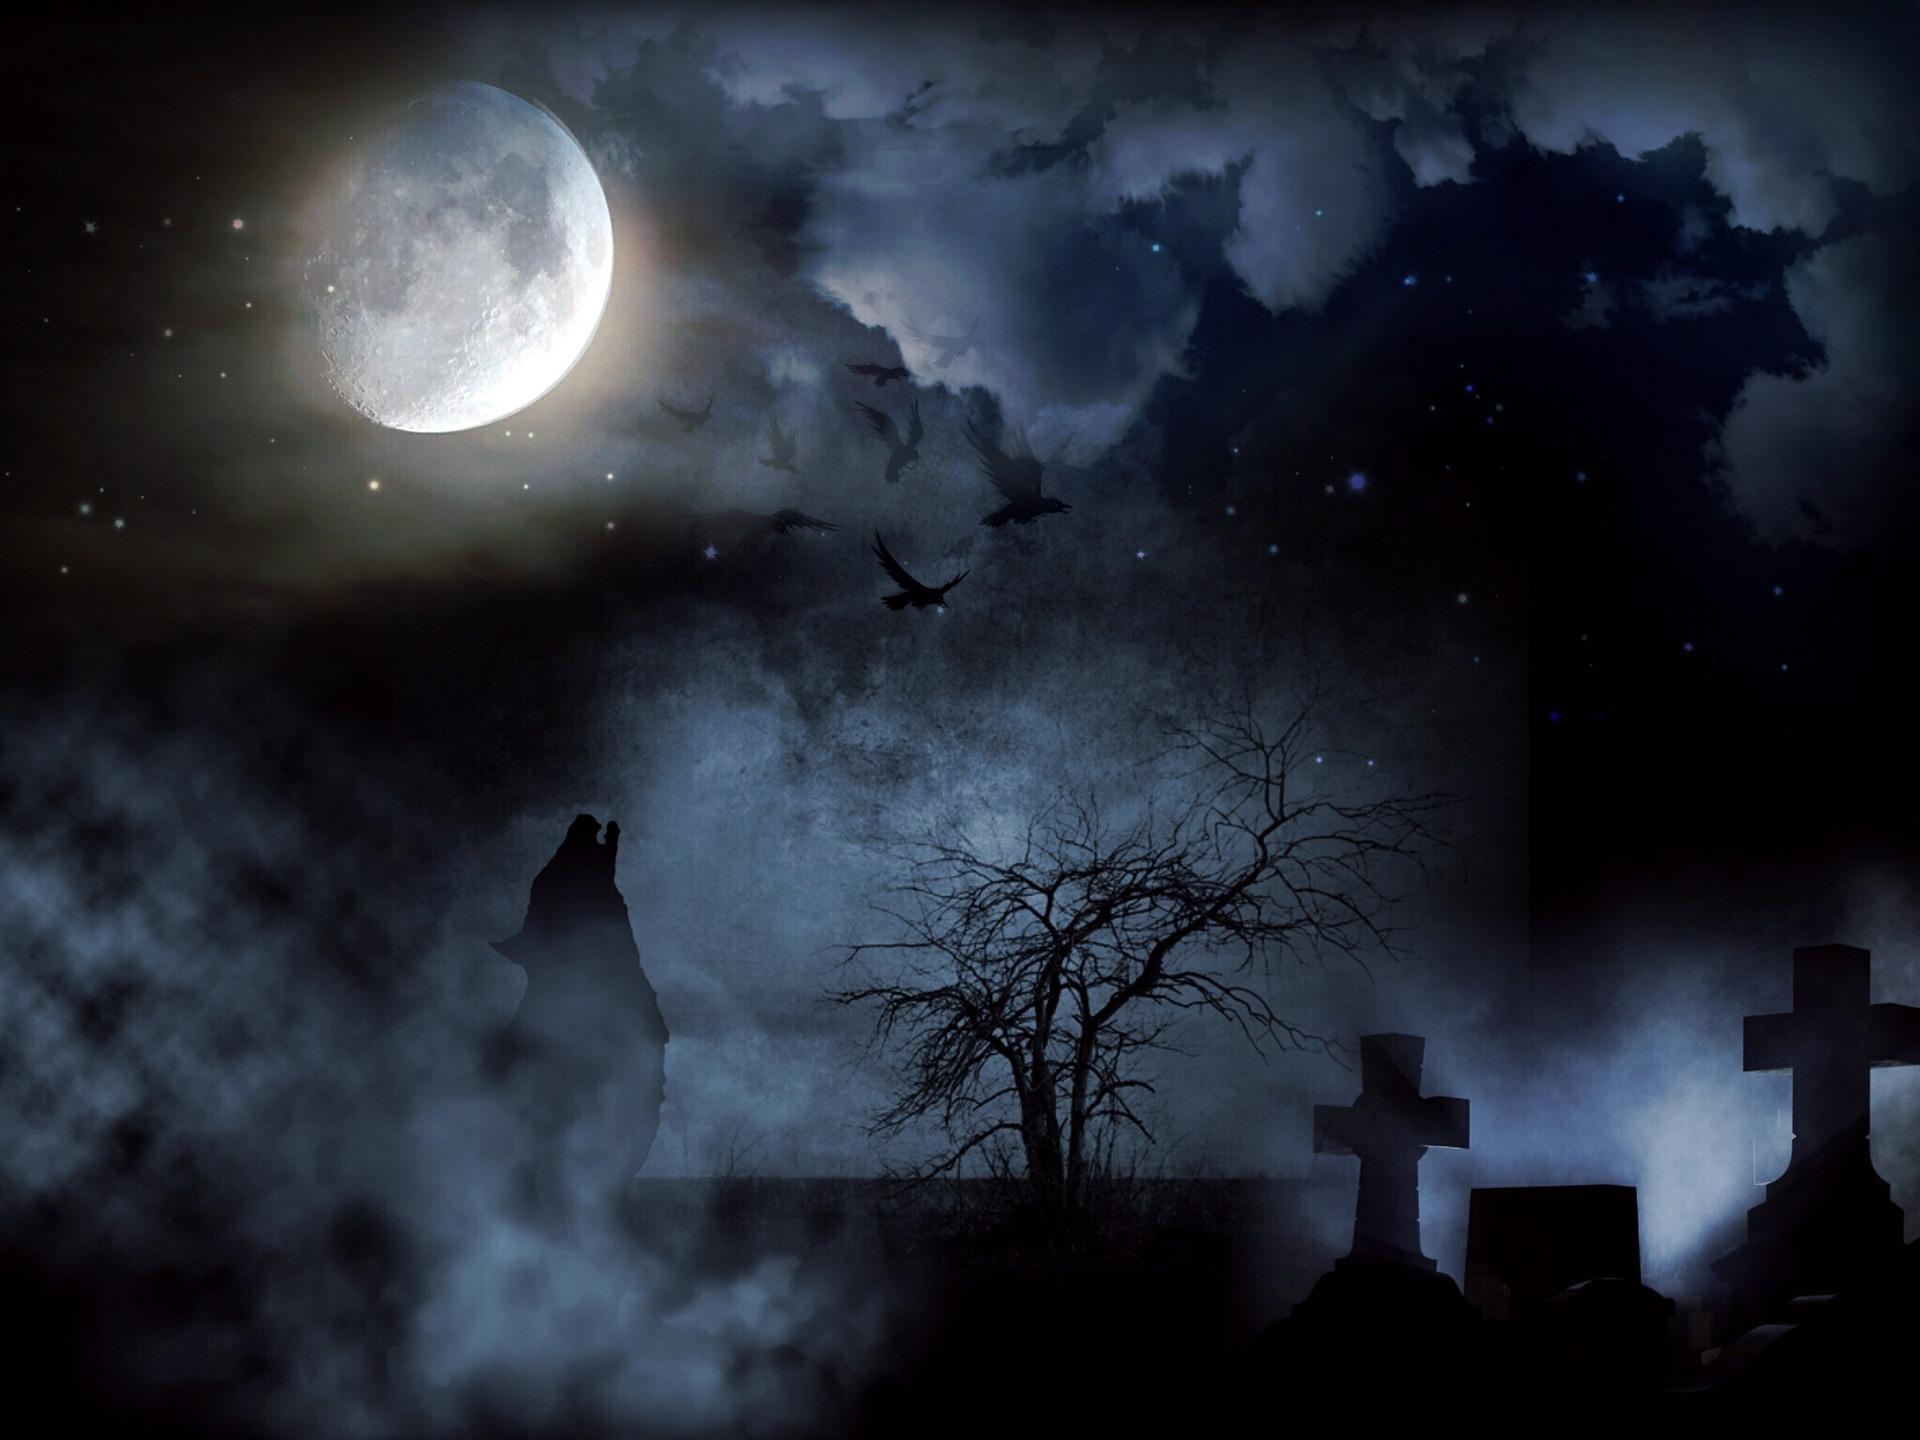 cemetery-395953_1920.jpg